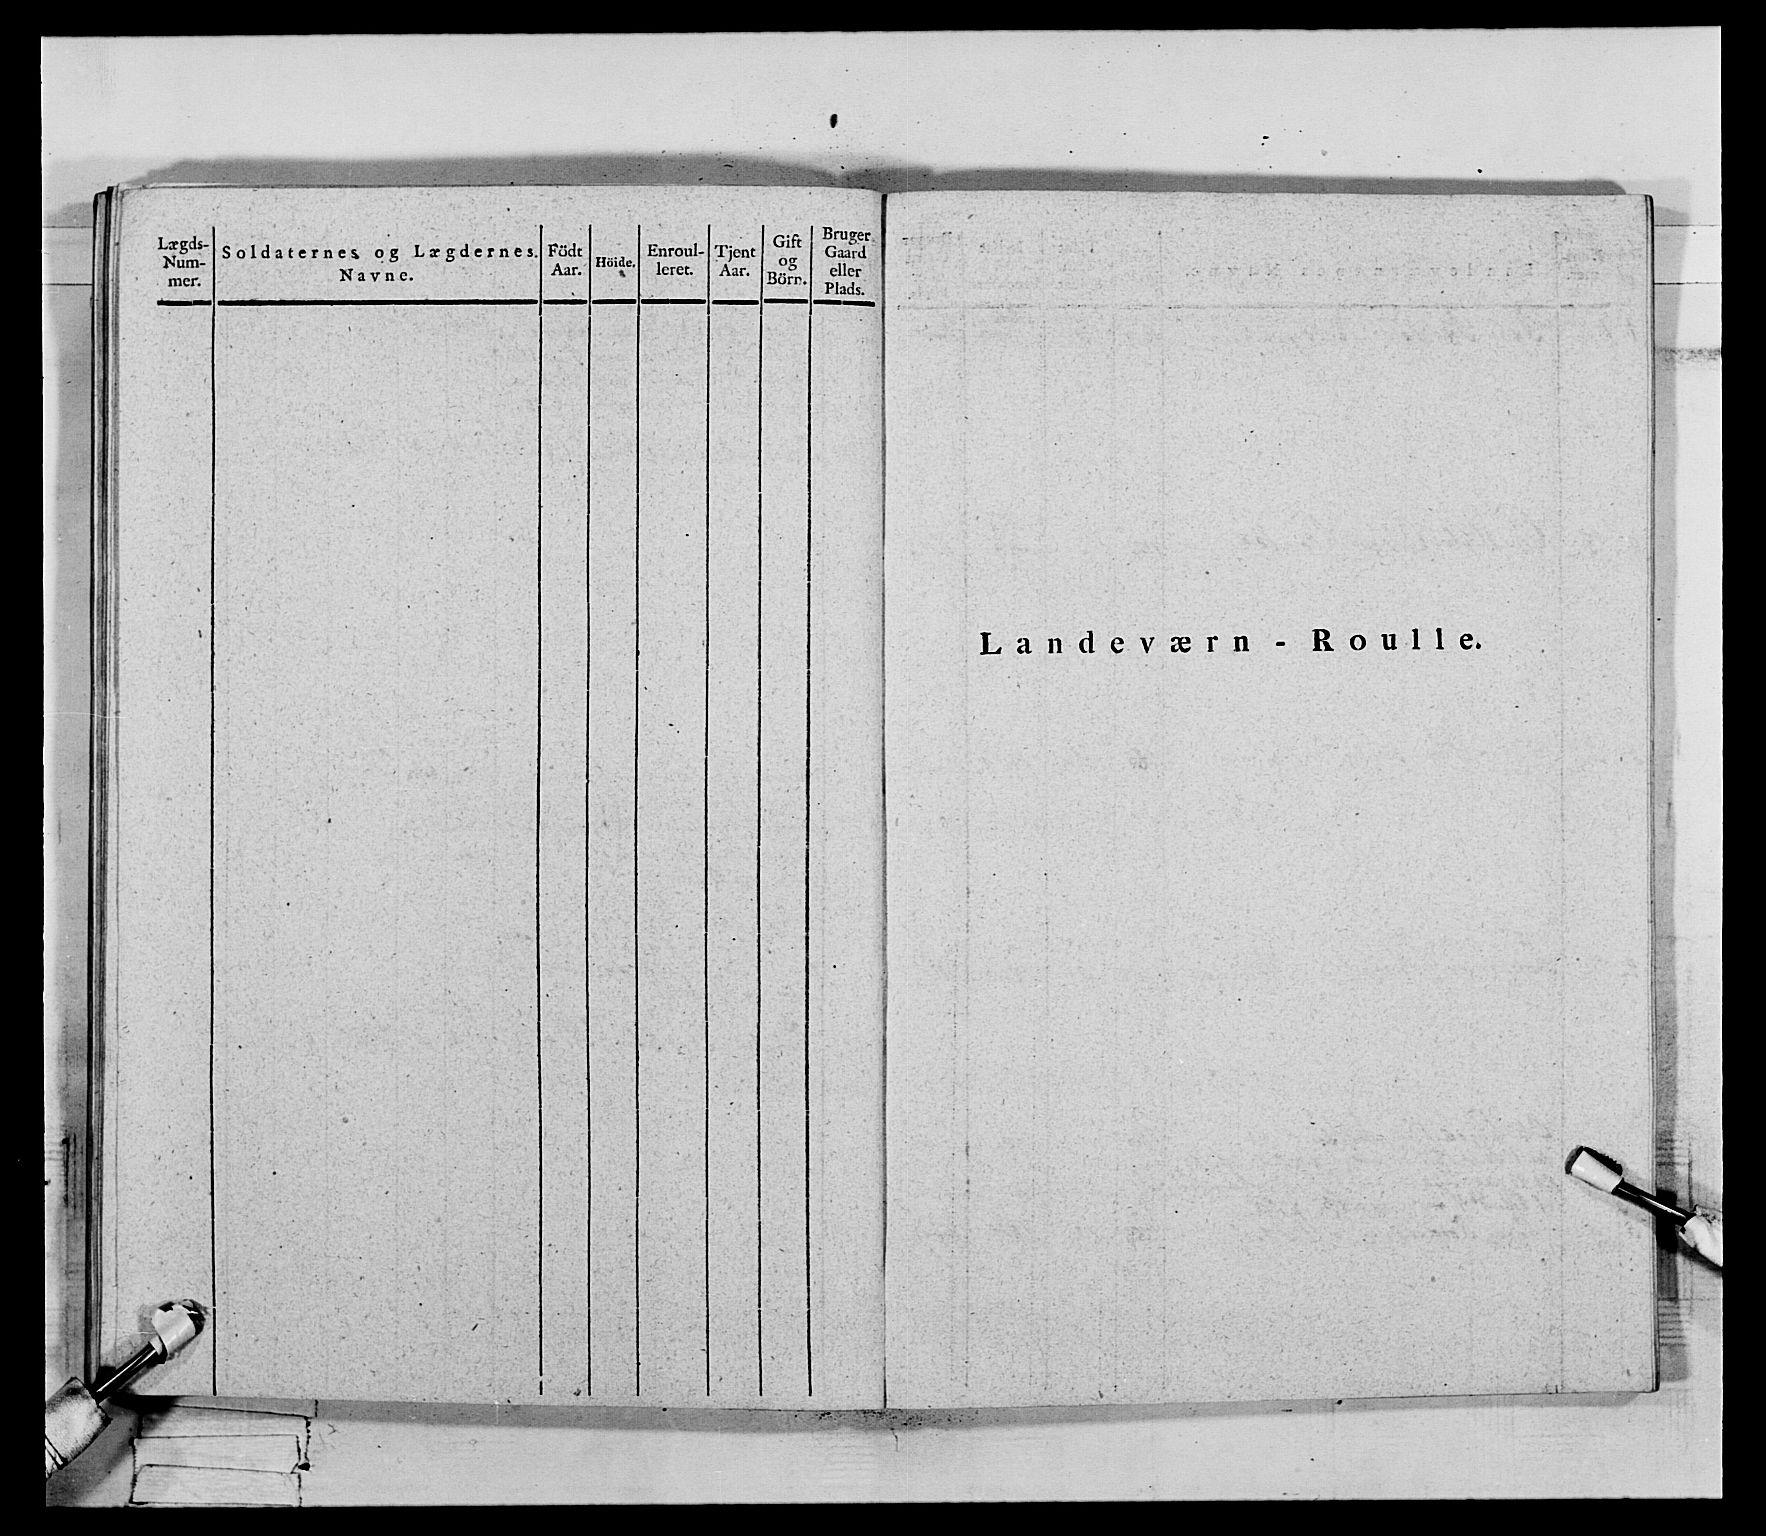 RA, Generalitets- og kommissariatskollegiet, Det kongelige norske kommissariatskollegium, E/Eh/L0069: Opplandske gevorbne infanteriregiment, 1810-1818, s. 543